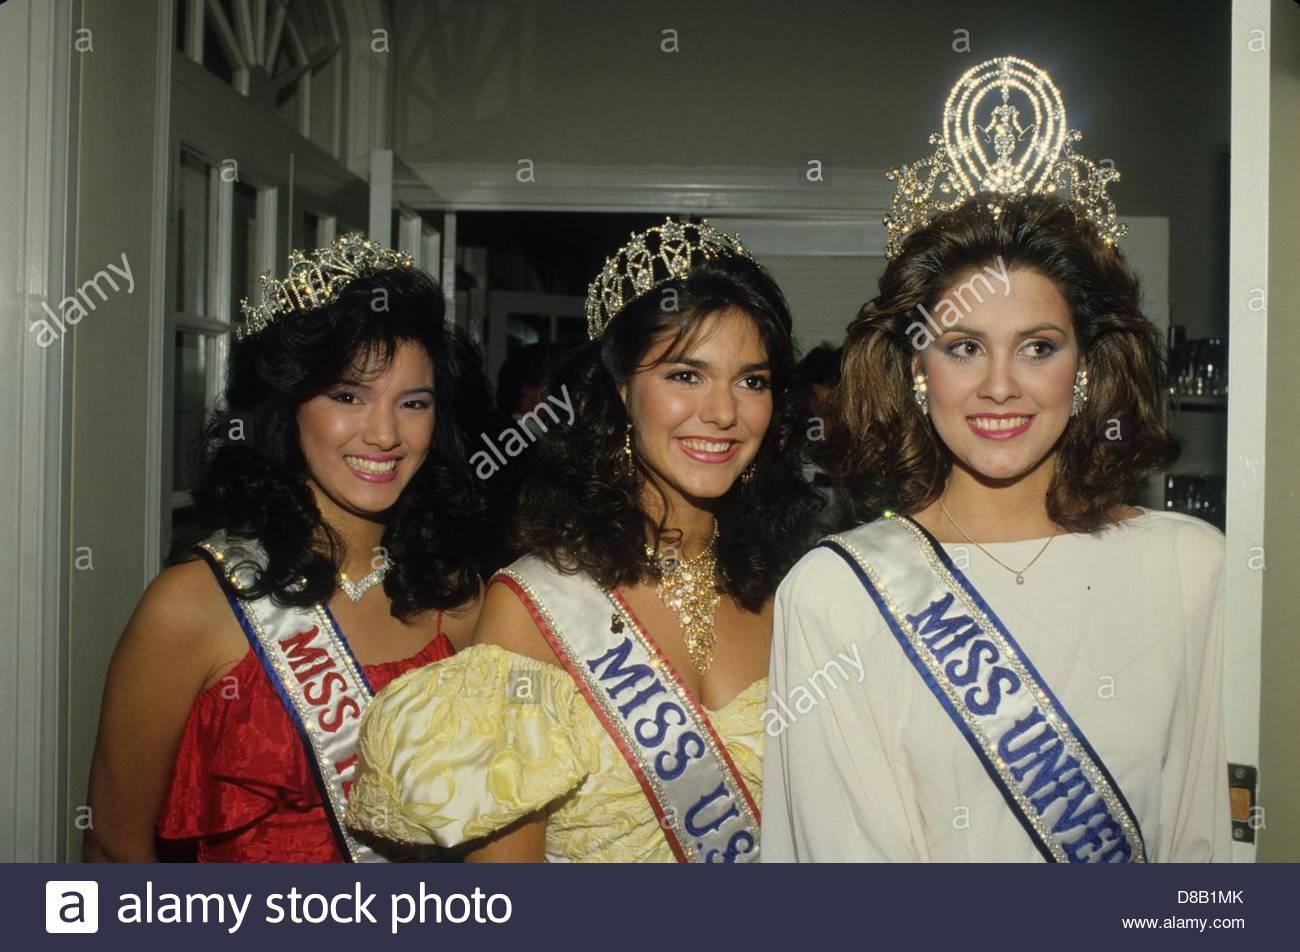 deborah carthy-deu, miss universe 1985. Laura-11